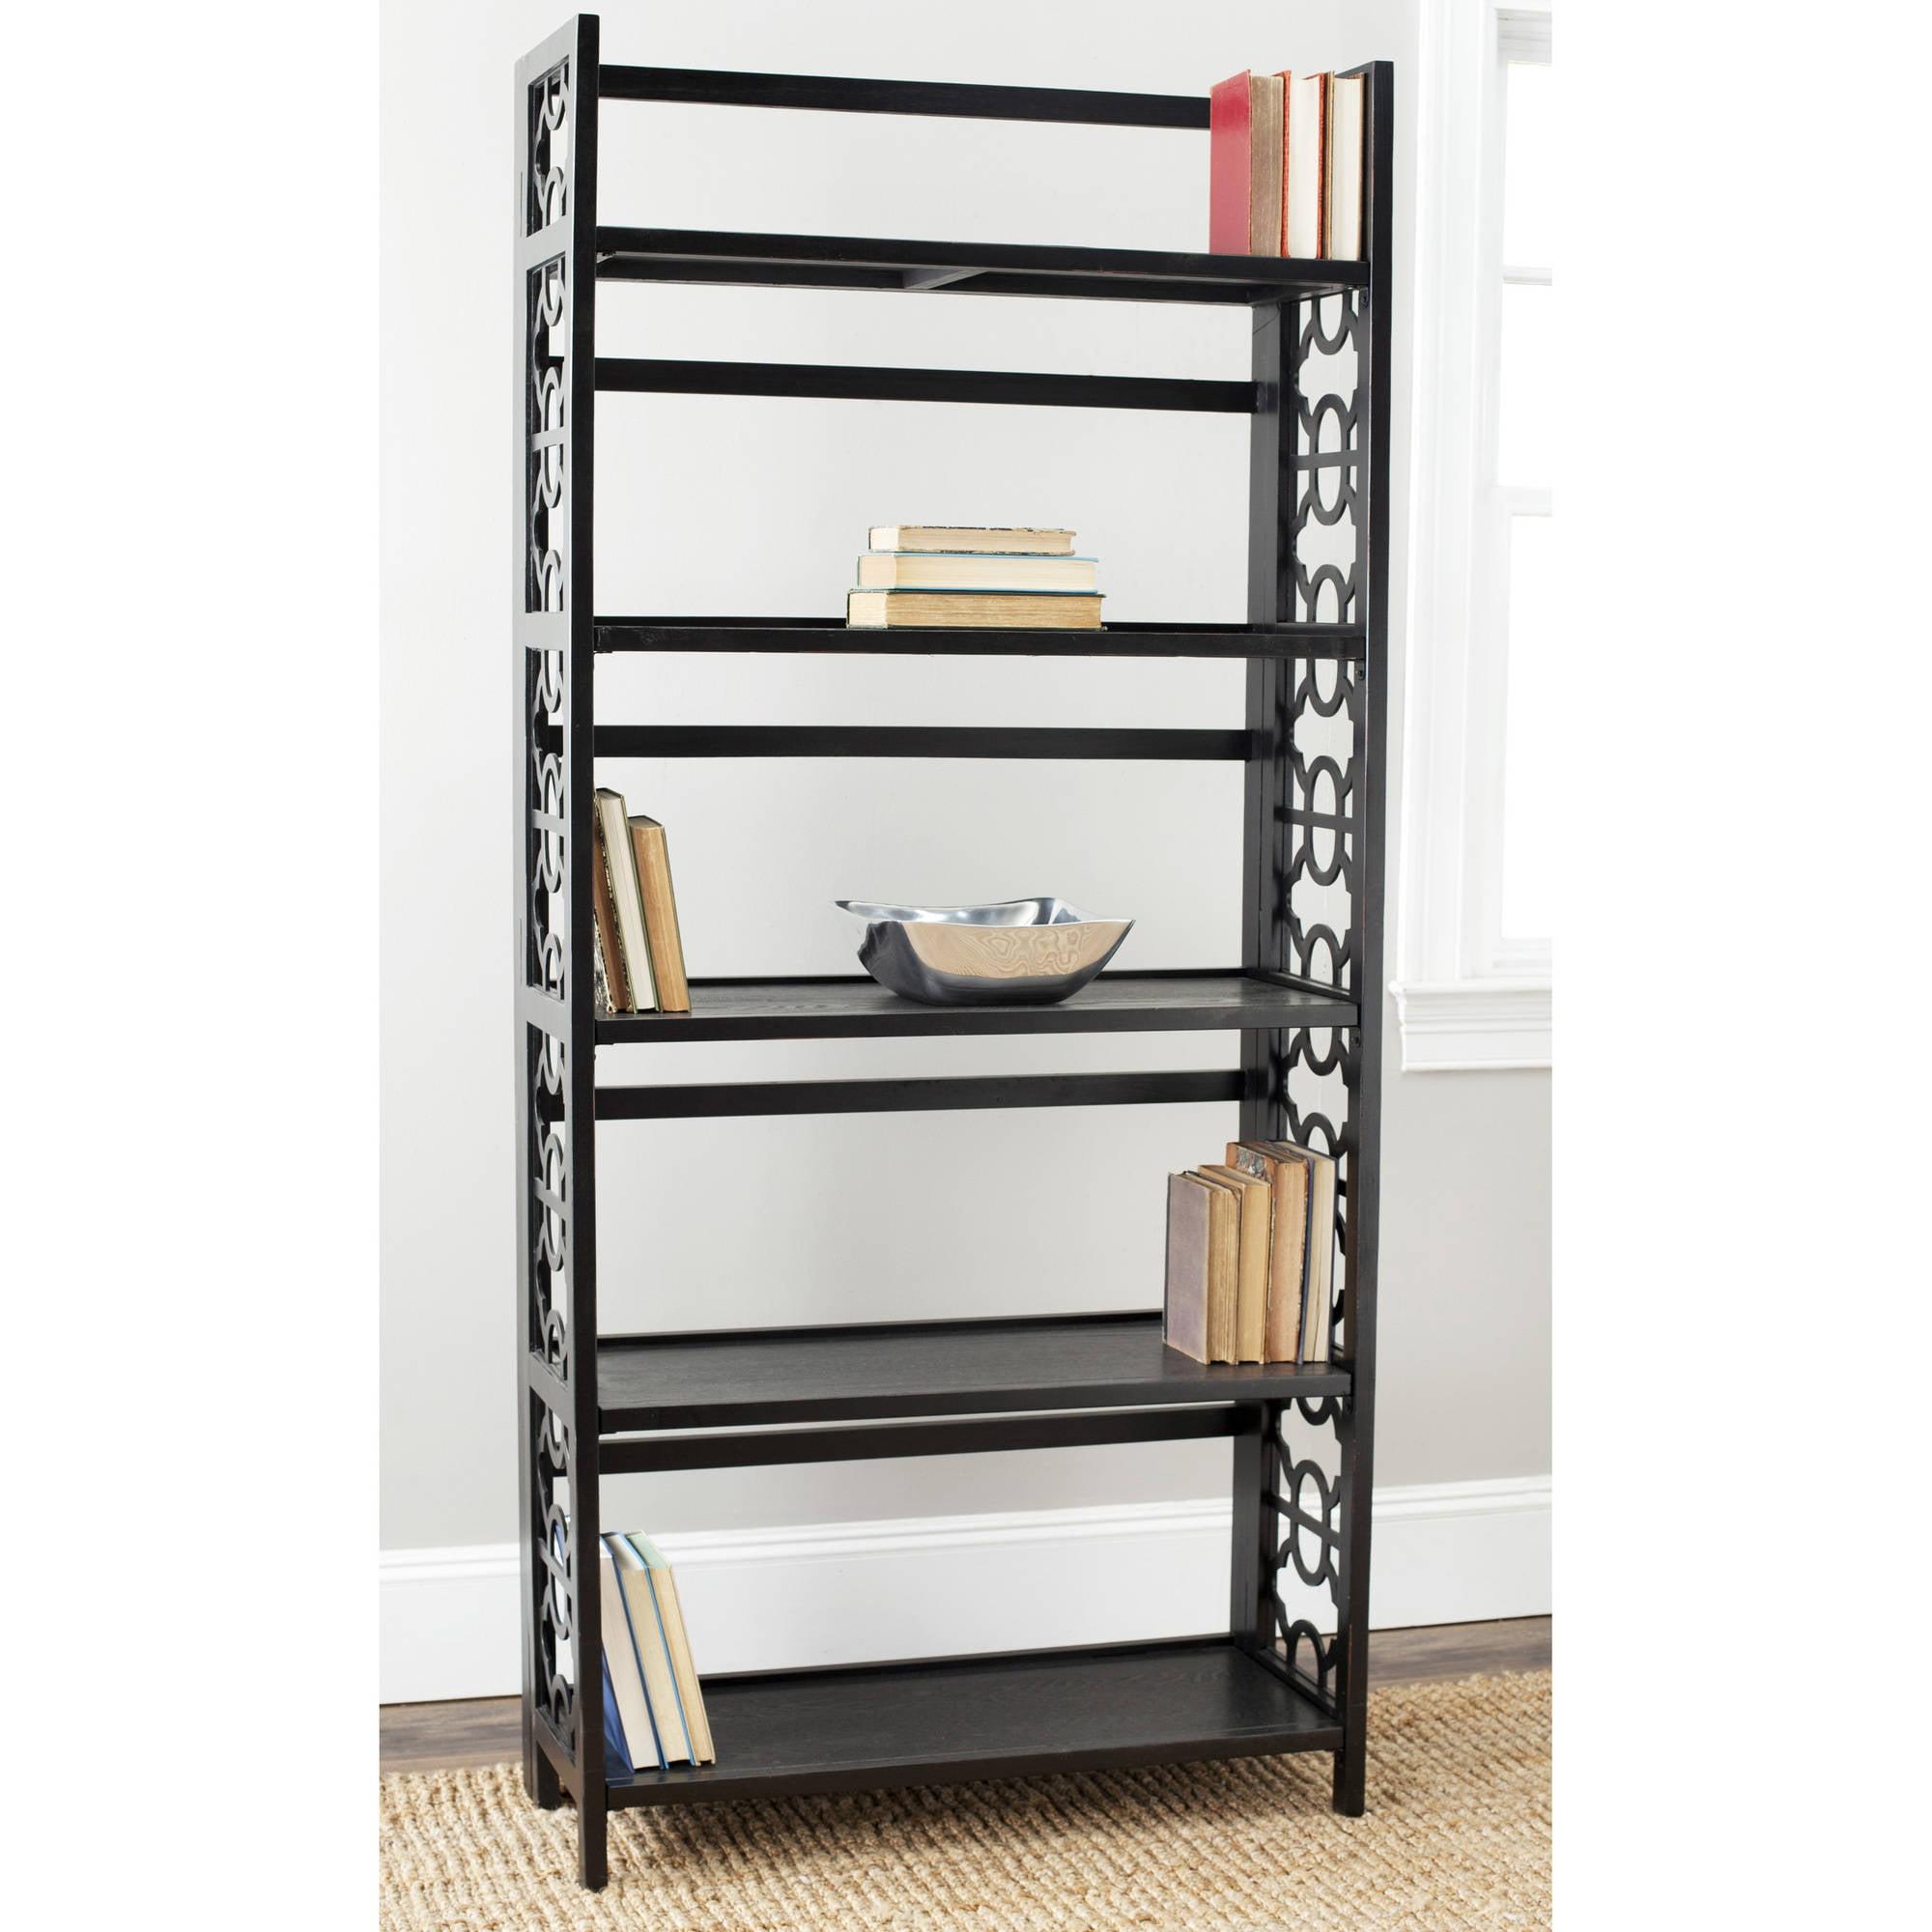 Safavieh Natalie 5-Shelf Tall Bookcase, Black